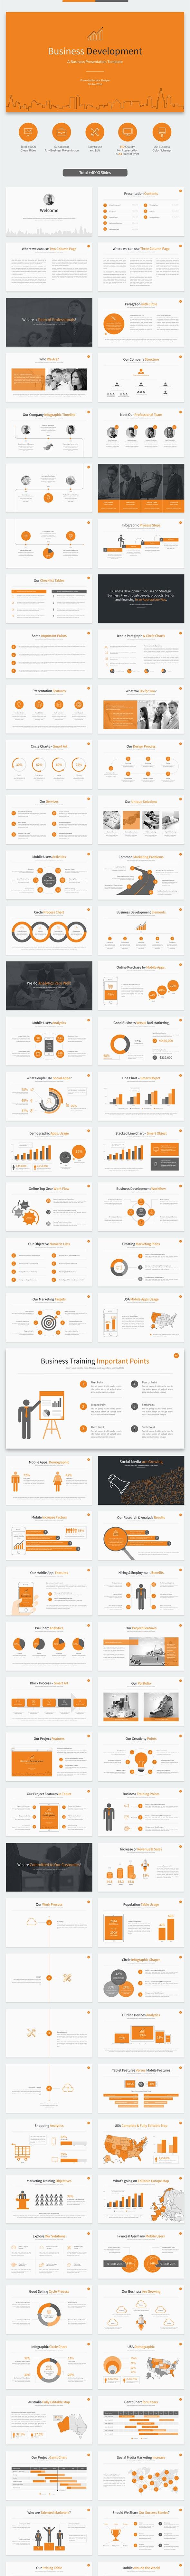 Business Development Google Slides Template - Google Slides Presentation Templates